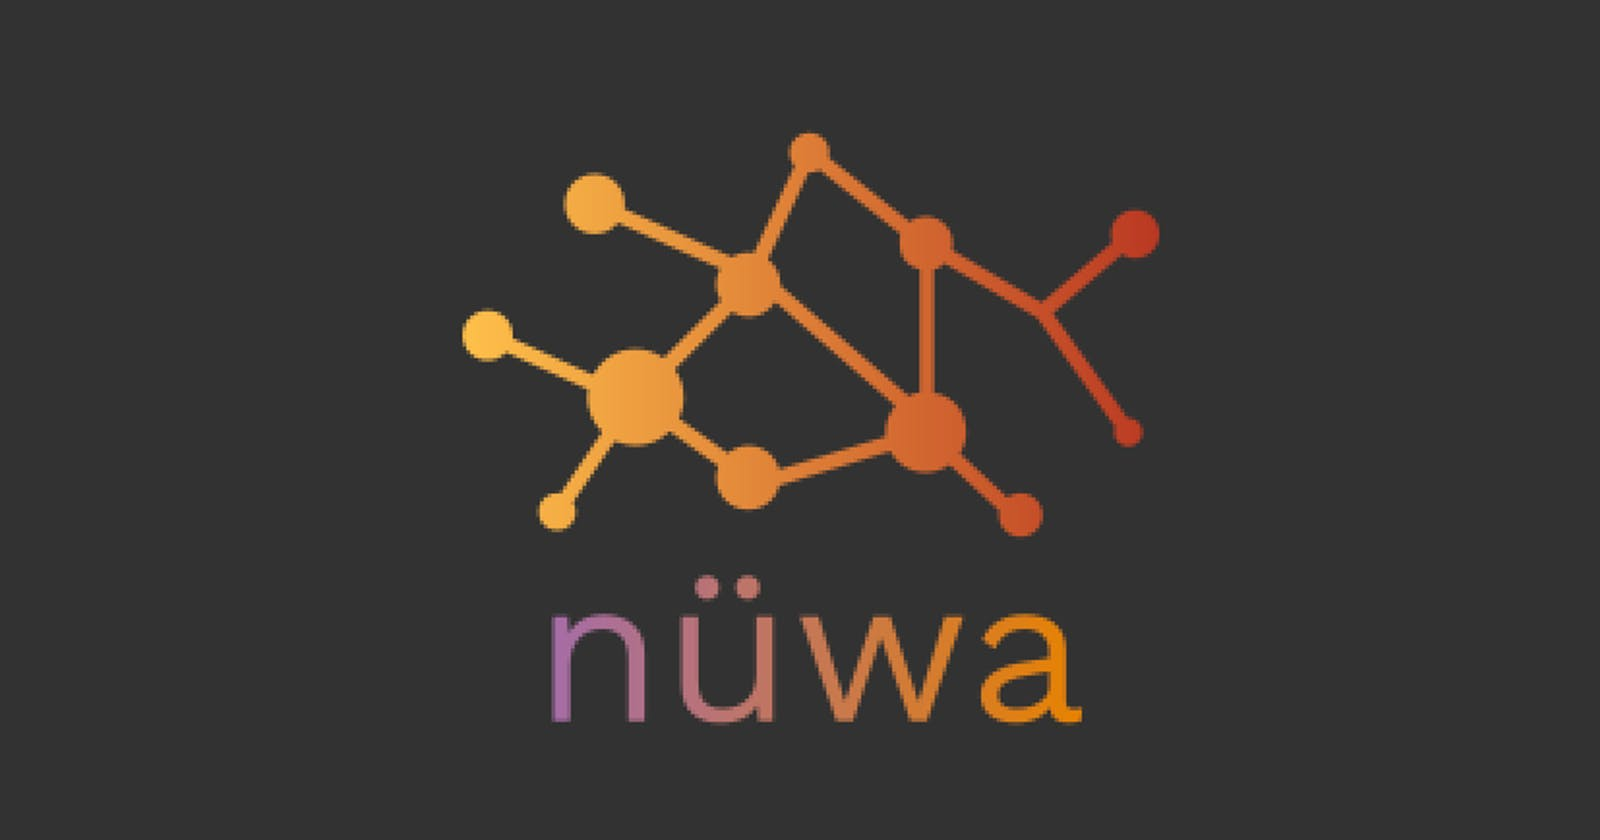 Introducing nüwa links, a simple URL shortener